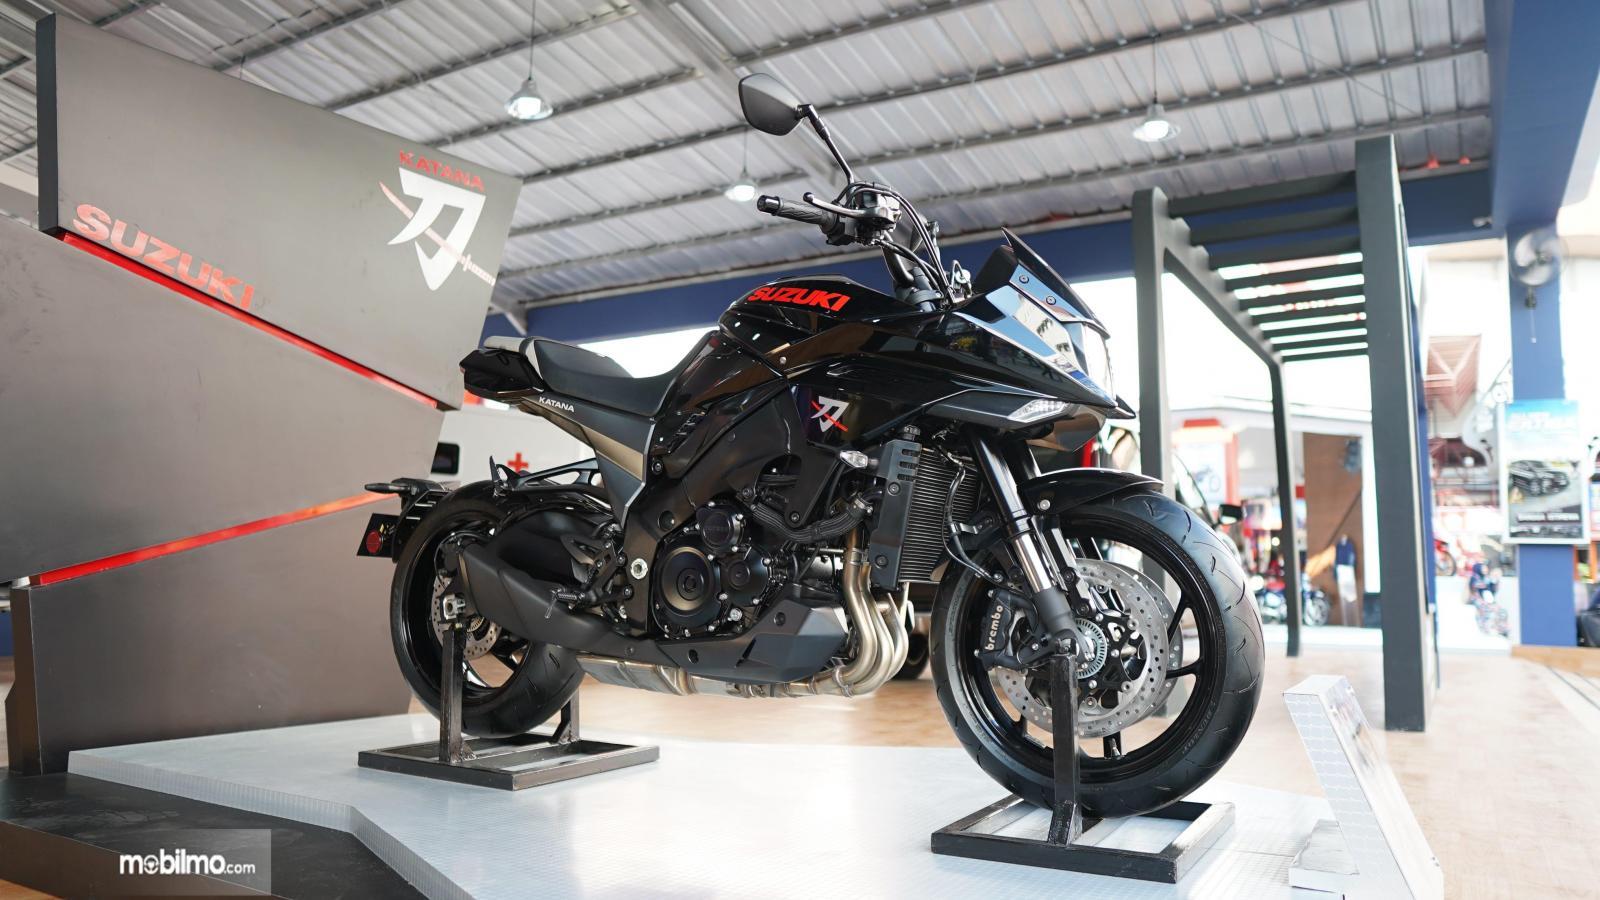 Foto sepeda motor Suzuki Katana di pameran JFK 2019